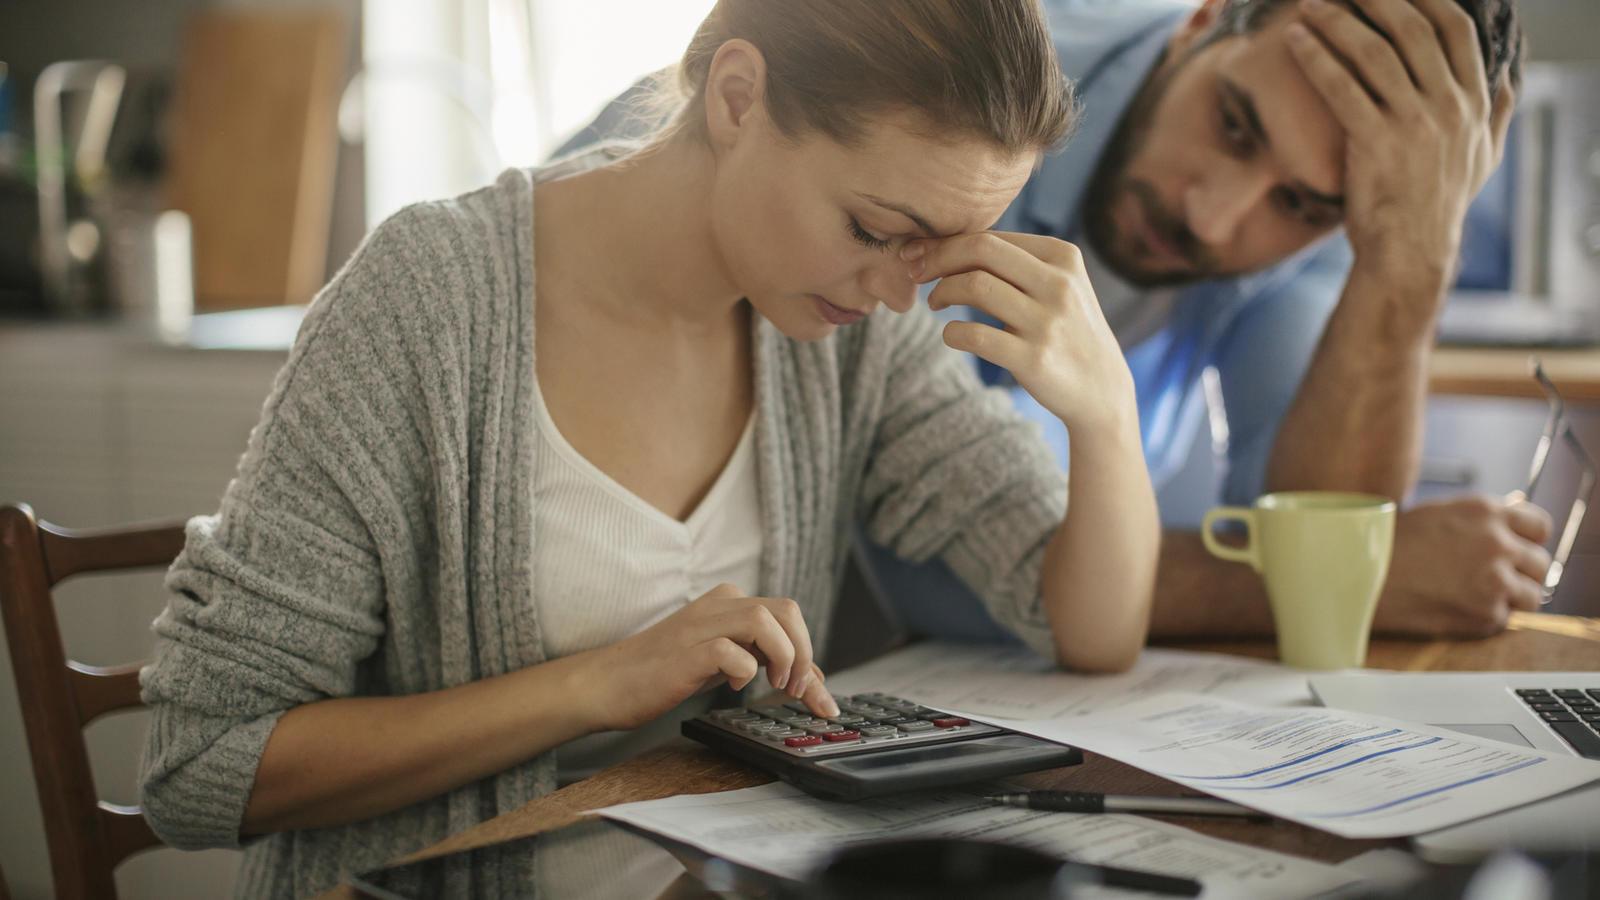 Wer wegen der Corona-Krise in Mietschulden gerät, wird ab April besonders geschützt.